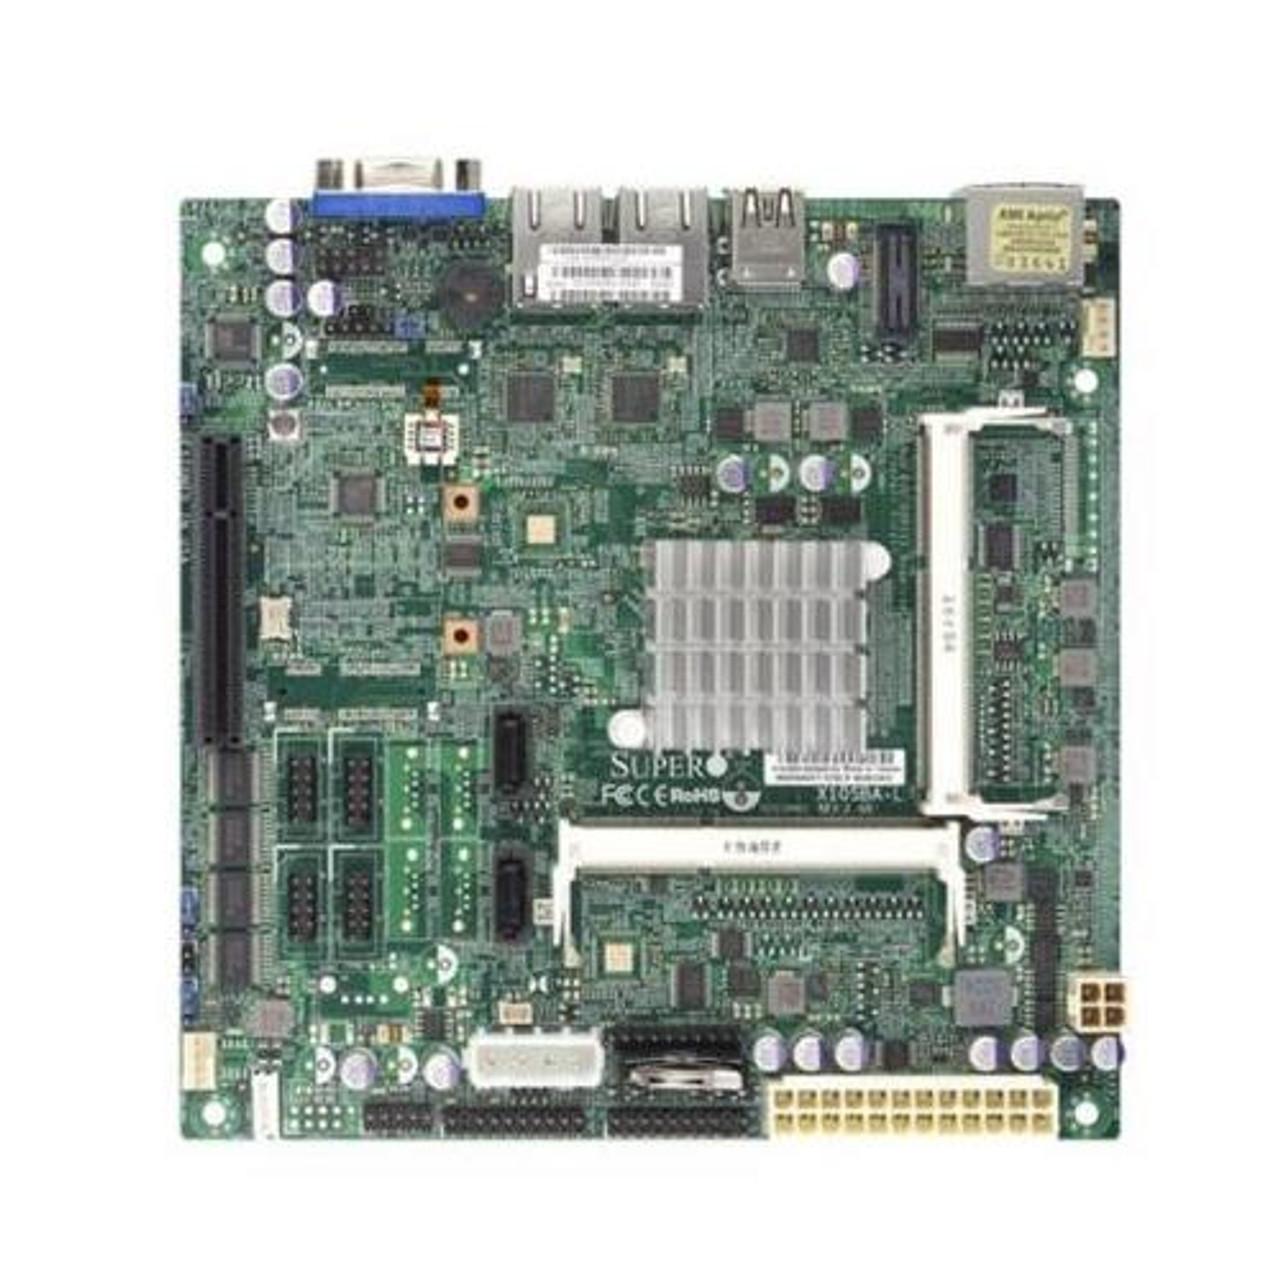 BULK PACK SOCKET G2 Supermicro MBD-X9SCV-QV4-B X9SCV-QV4 CORE I7//I5//I3 CELERON B800 SERIES SUPPORTED